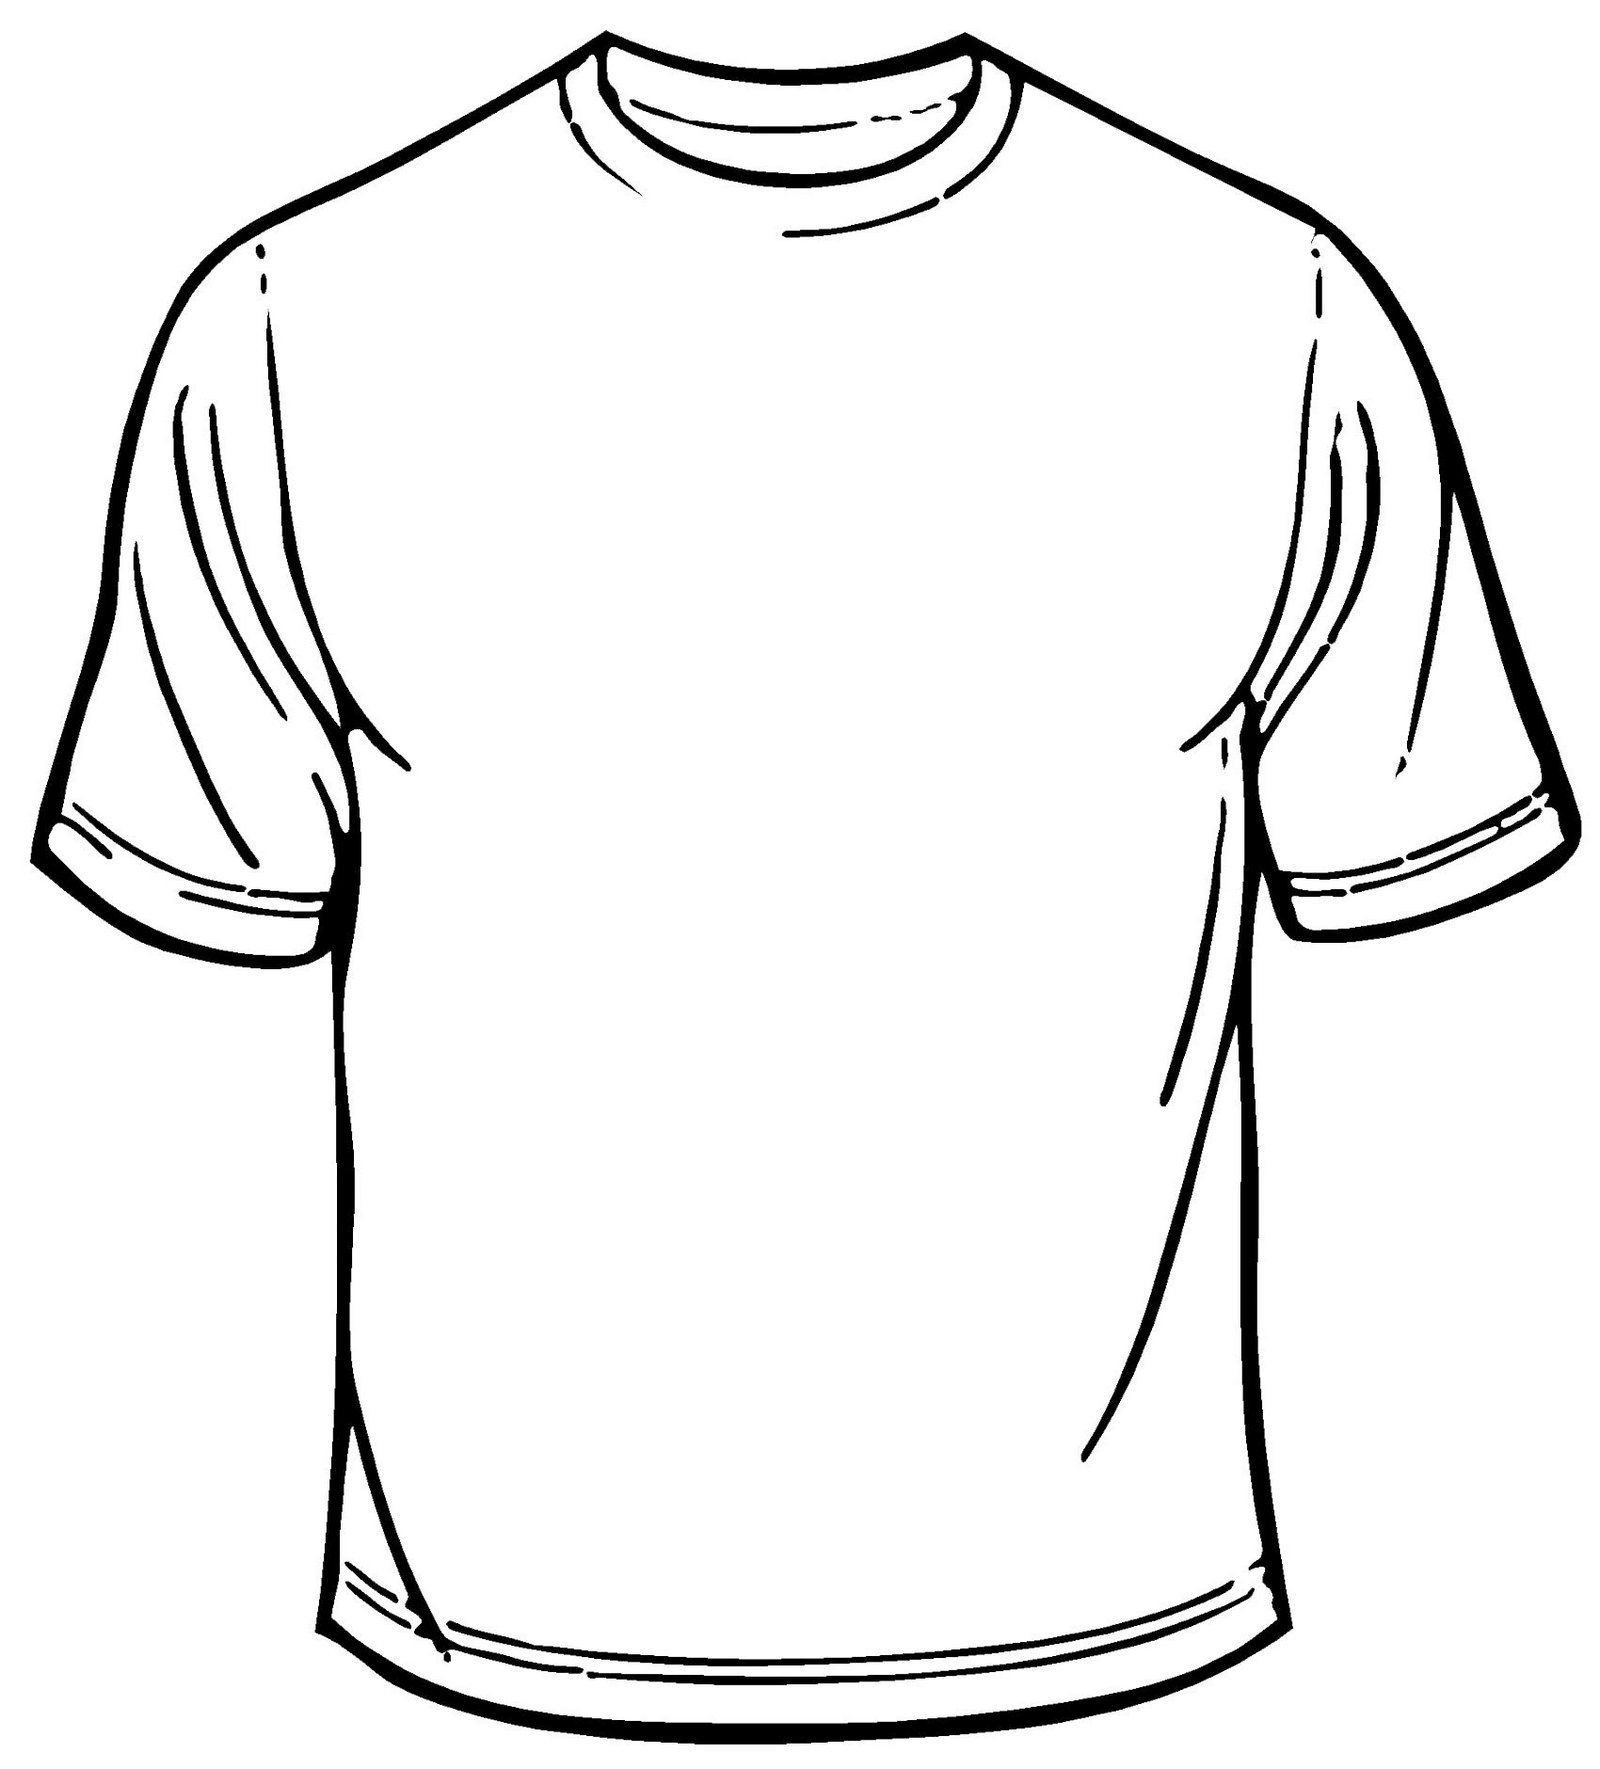 Printable T Shirt Templates Blank T Shirt Coloring Sheet Printable